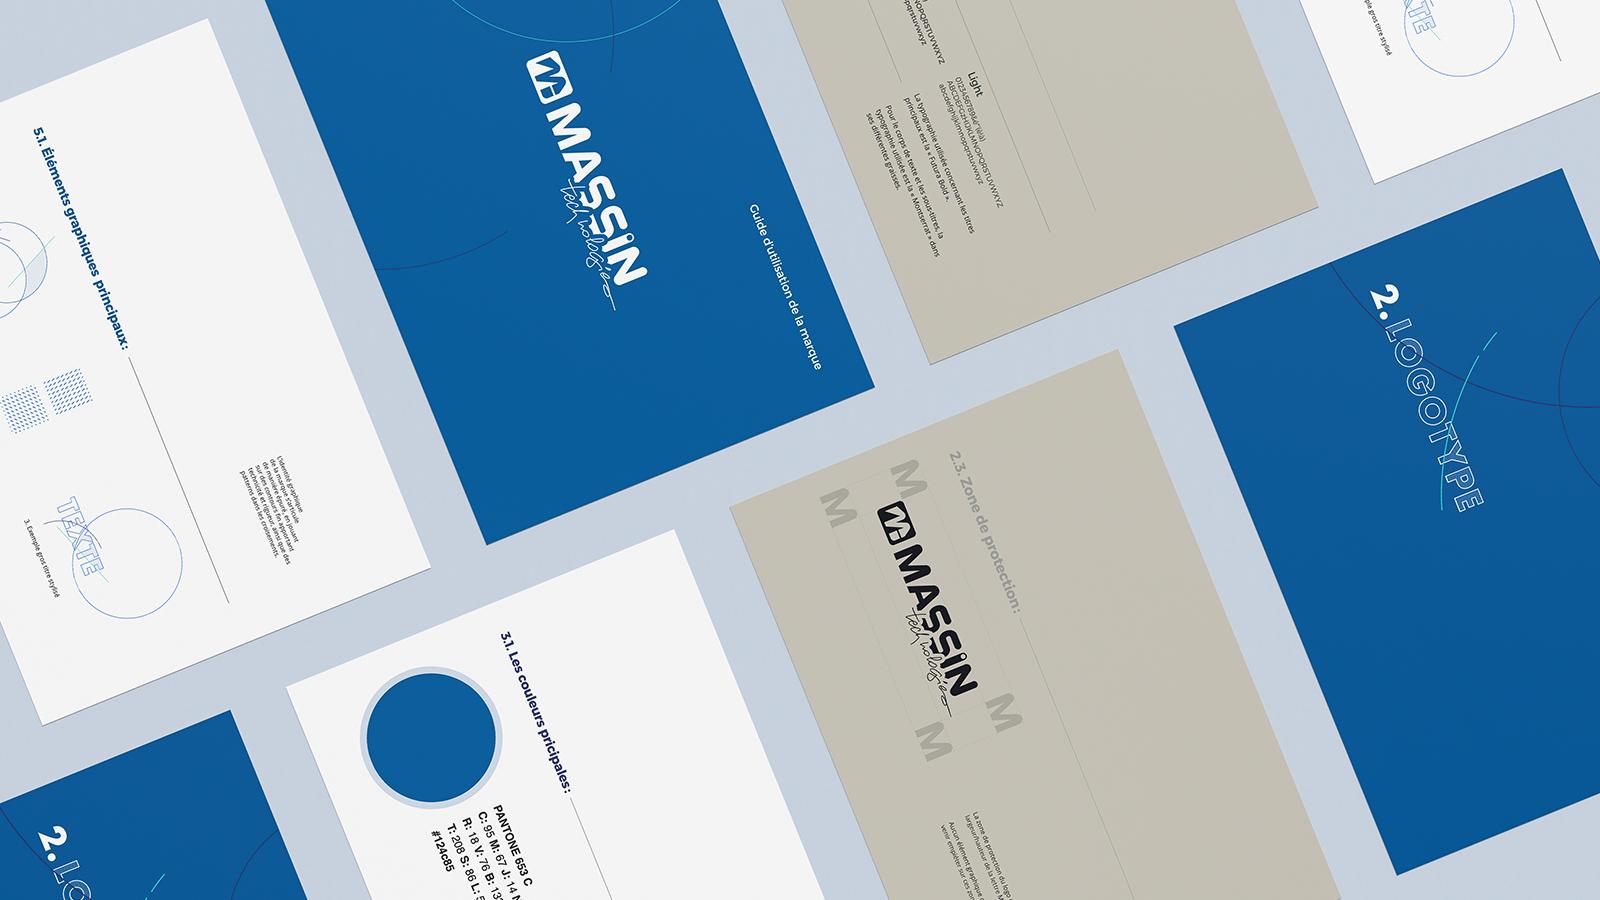 Charte - Massin Technologies